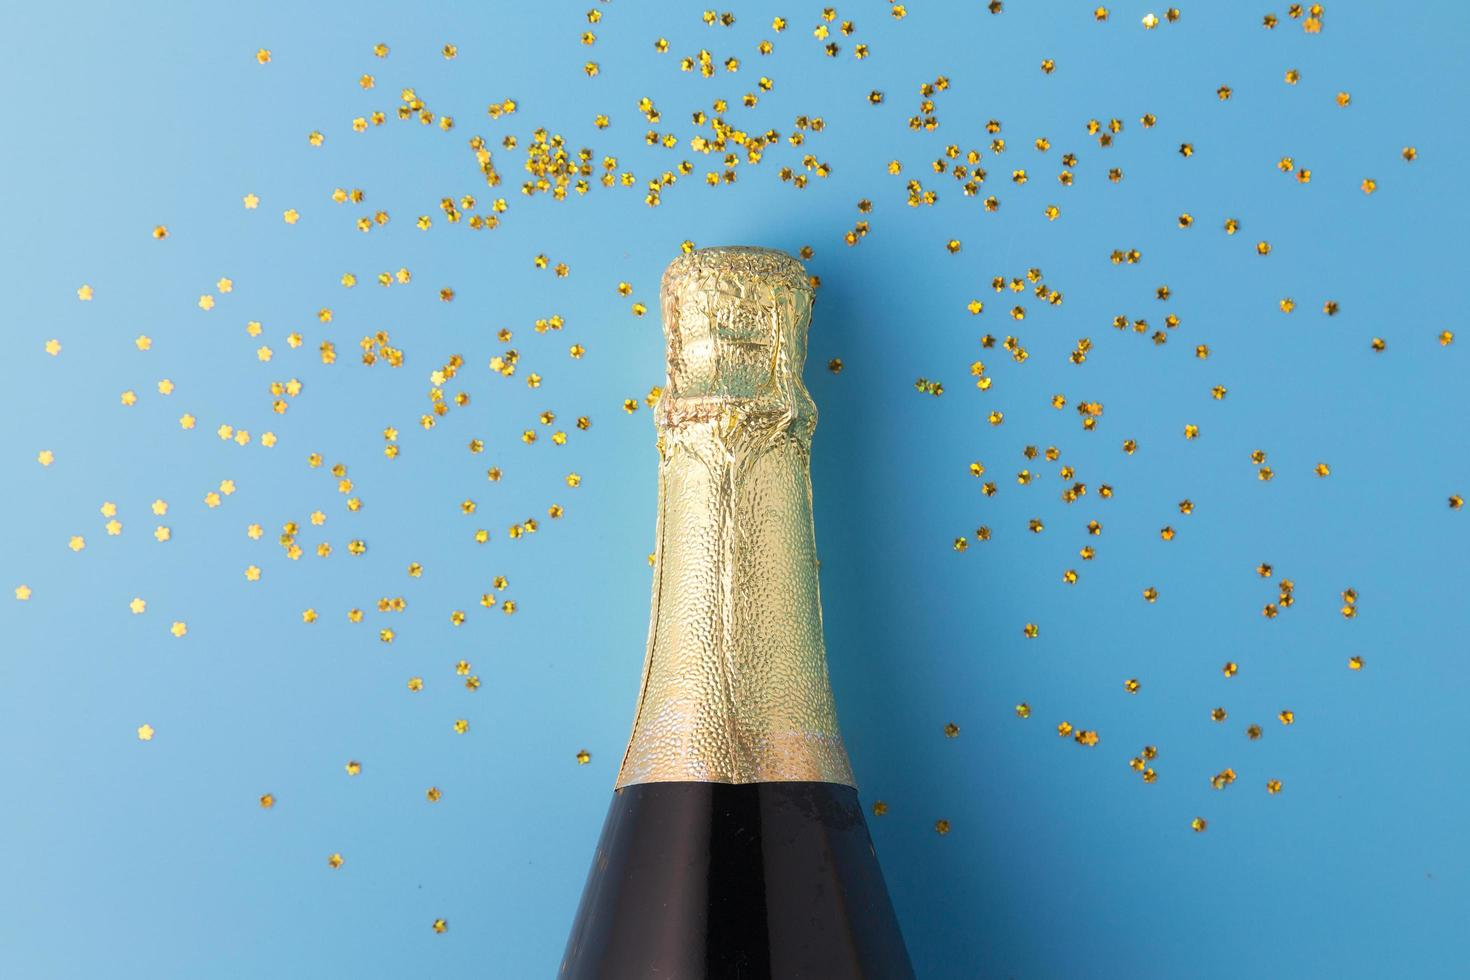 plat lag van champagne fles foto